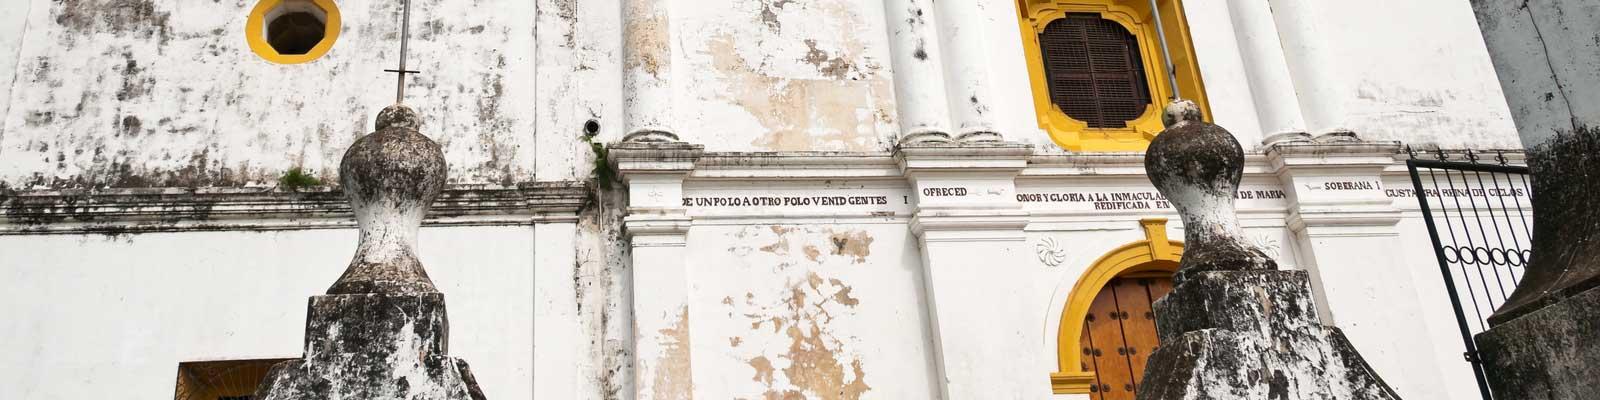 Nicaragua Igrejas Cultura  Residencial, Comercial, Terrenos. A venda, ou para Alugar.